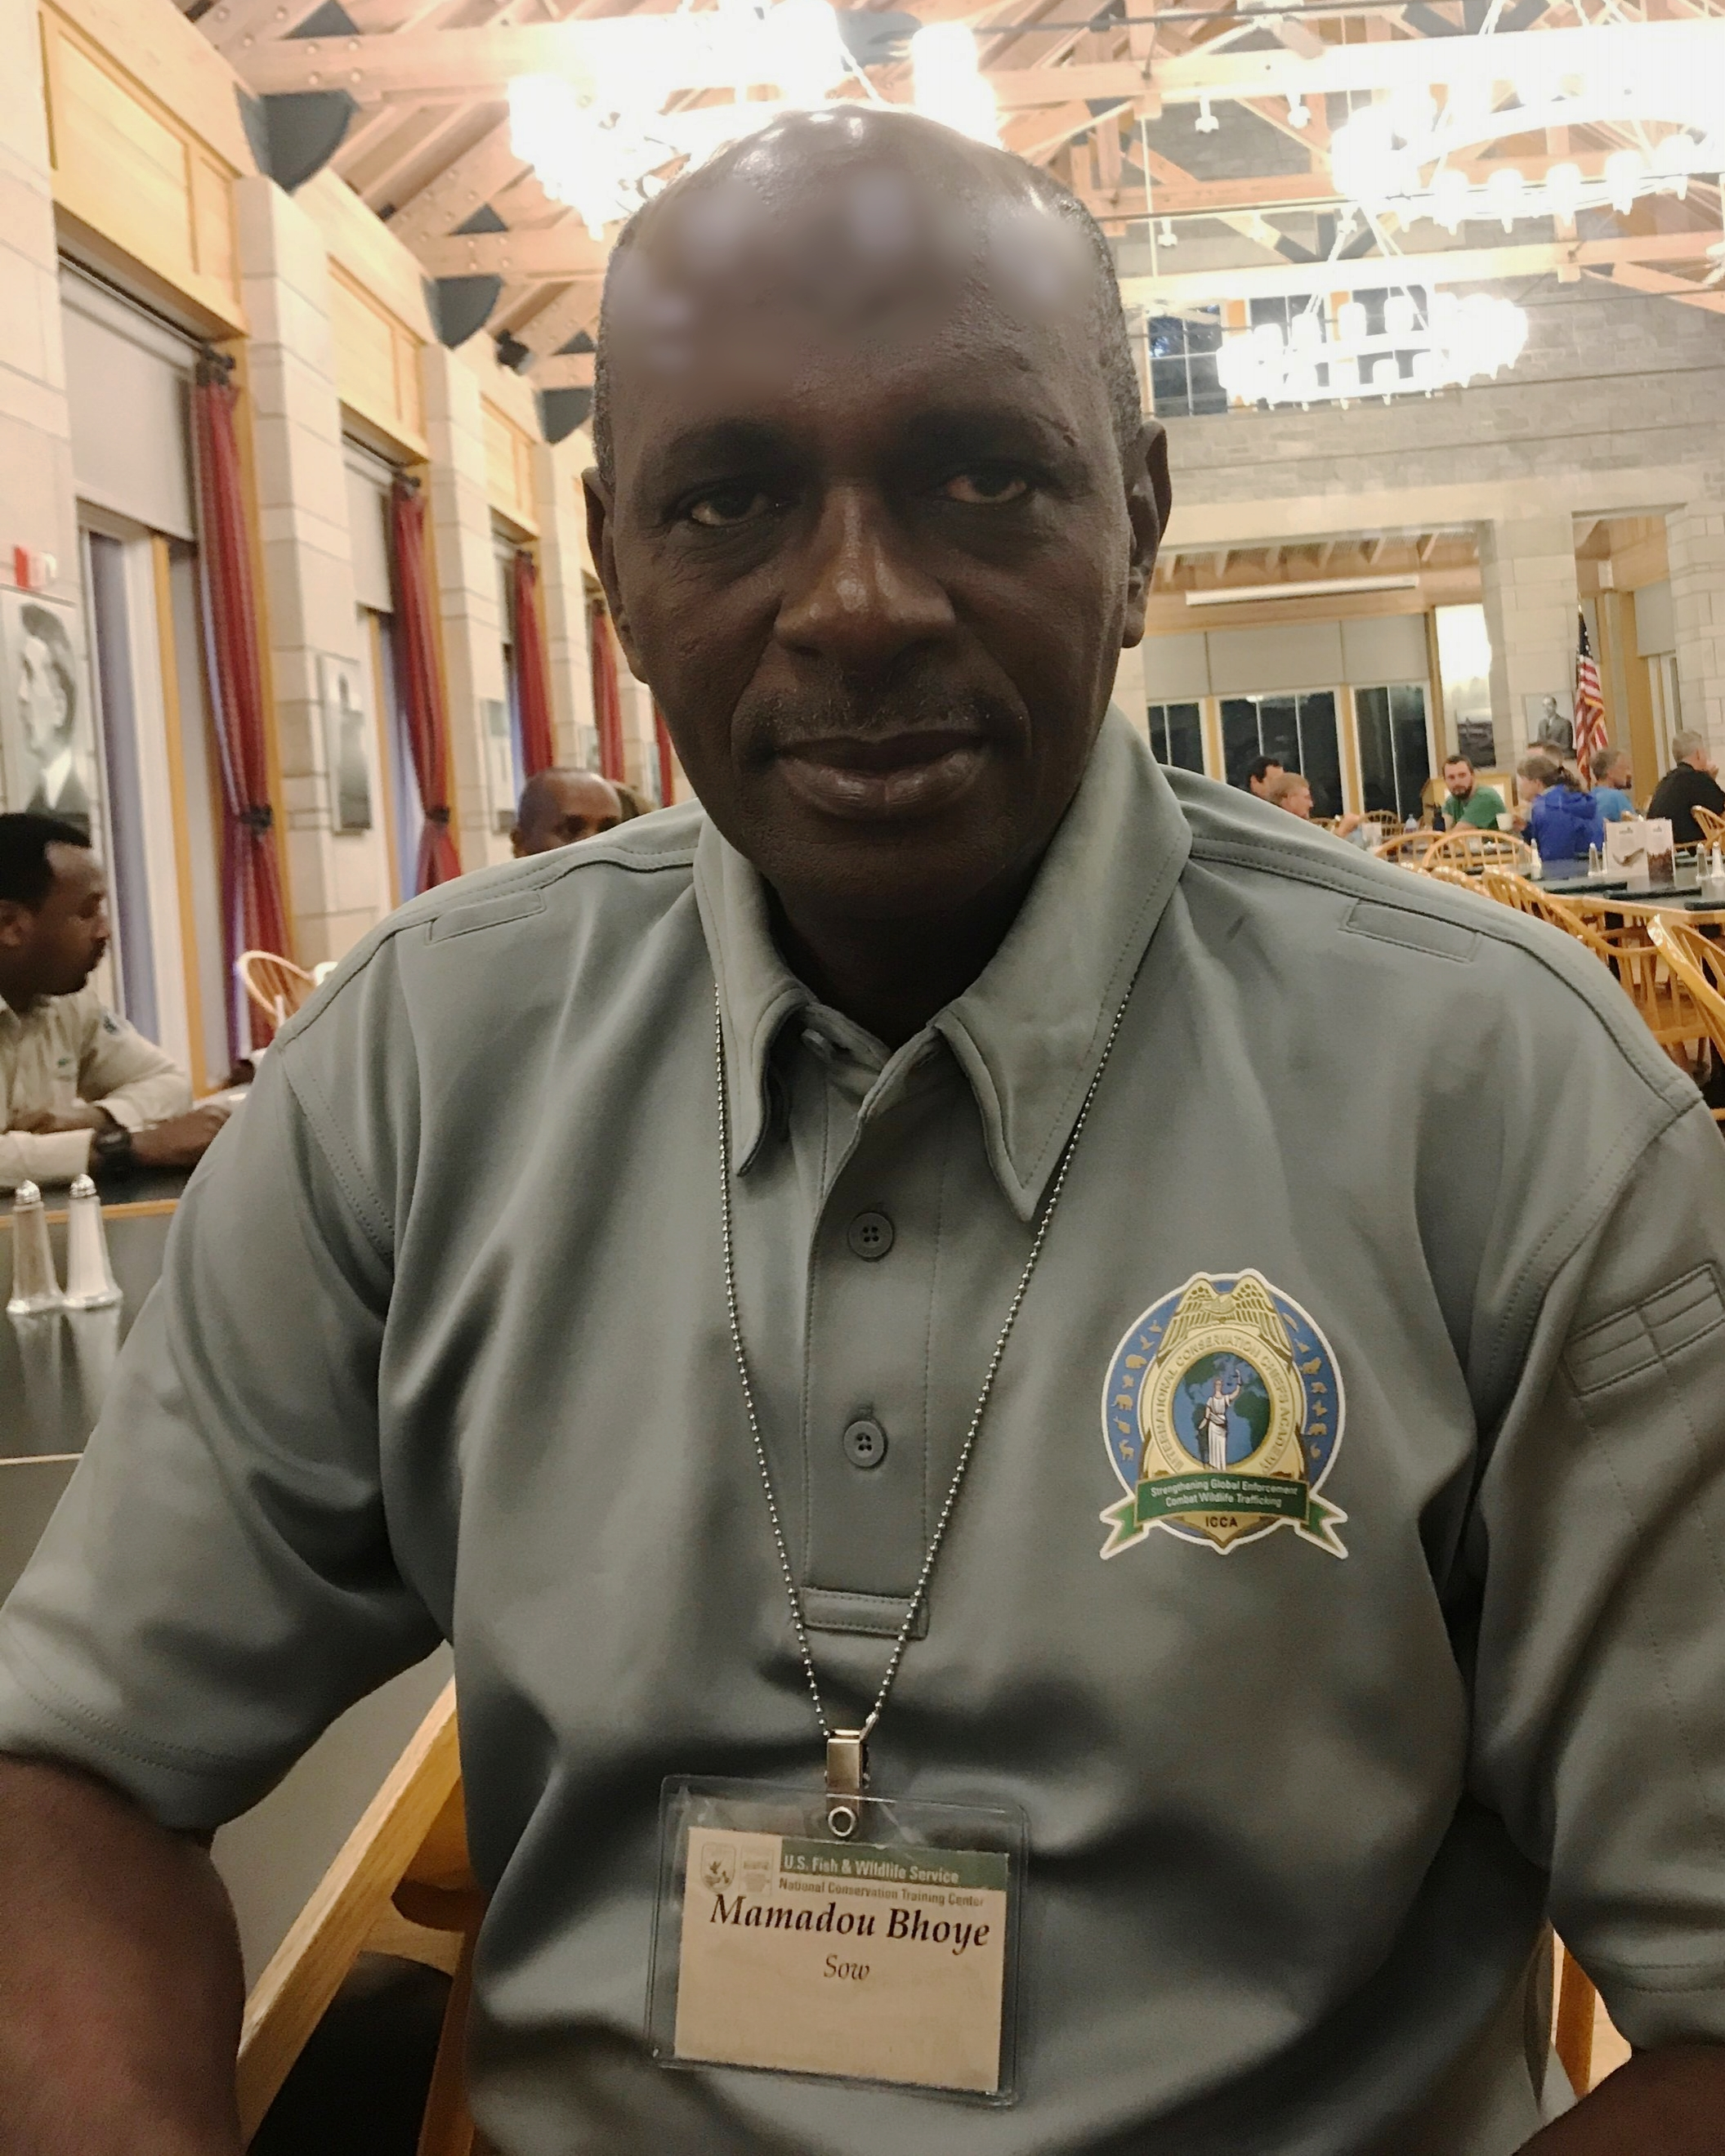 Colonel Mamadou Bhoye Sow of Guinea